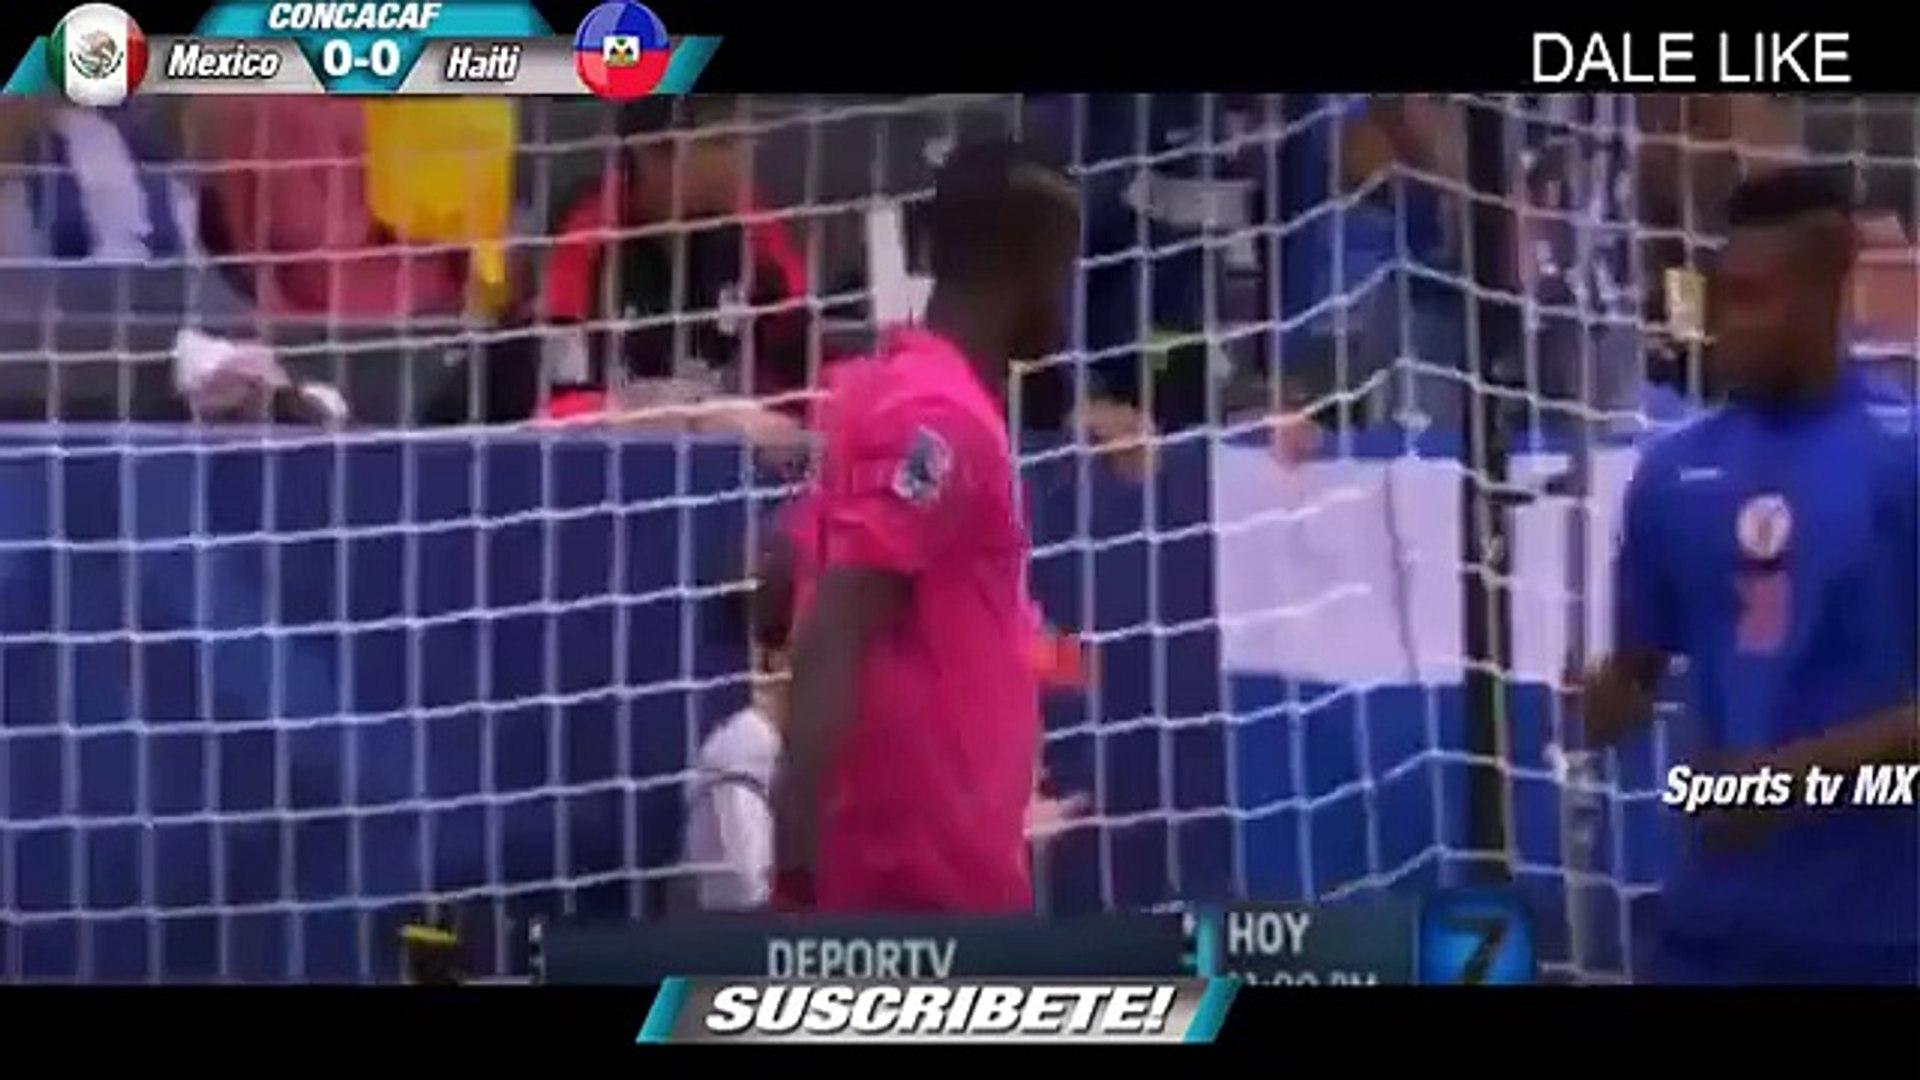 Mexico vs Haiti 1-0 GOL RESUMEN SUB 22 HD PREOLIMPICO 2015 TV Azteca